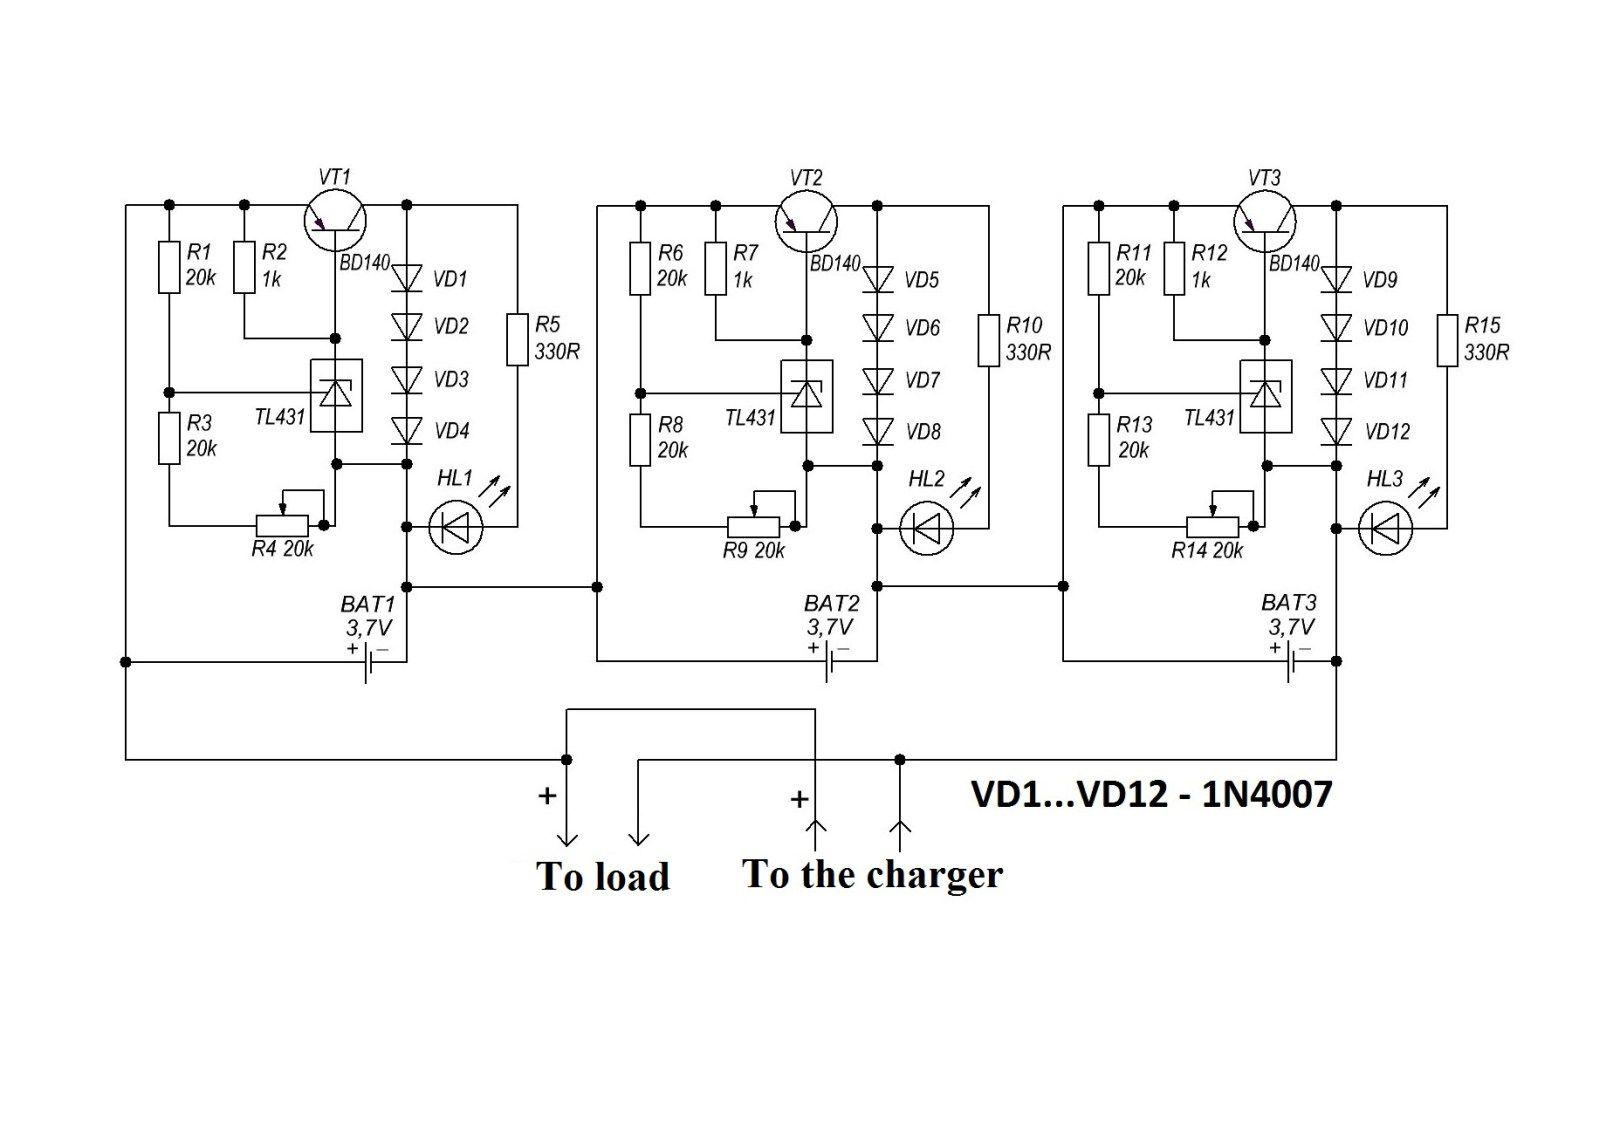 Enjoyable Bms Circuit Technology Electronics Projects Electronics Wiring 101 Capemaxxcnl